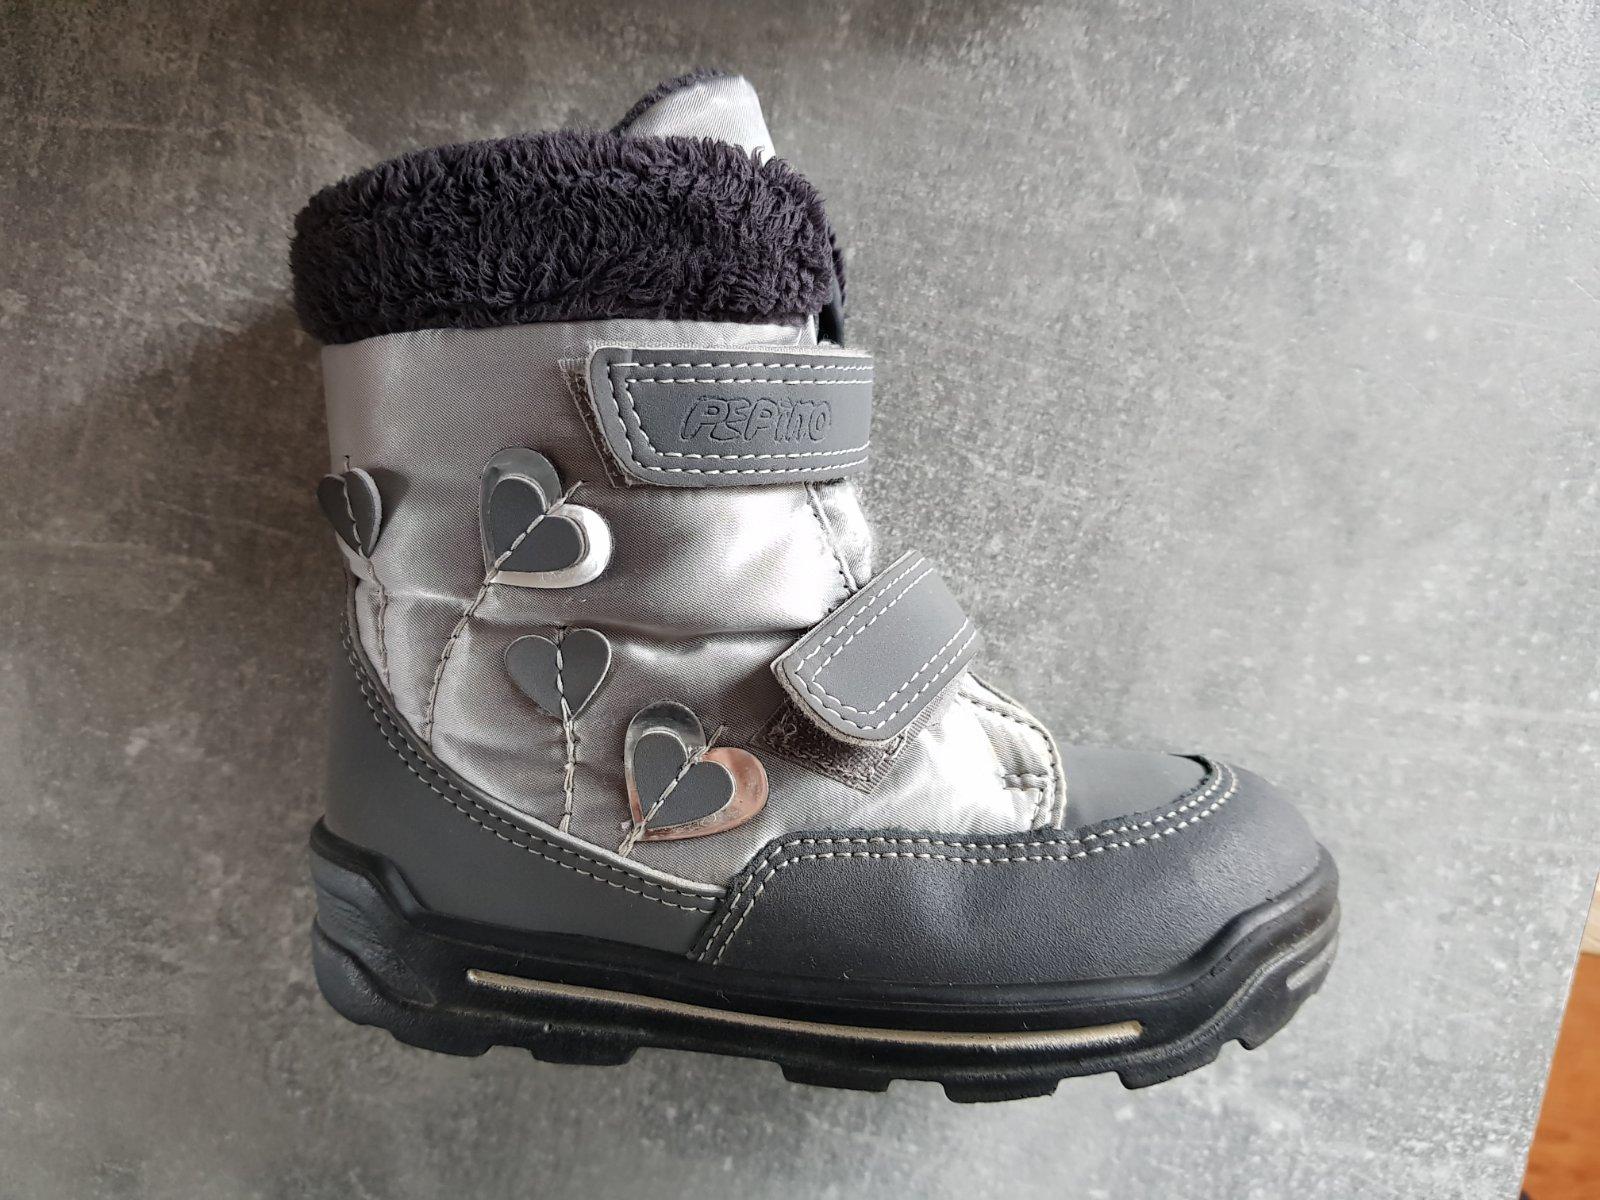 cbcdc92b64d Zimní boty pepino ricosta